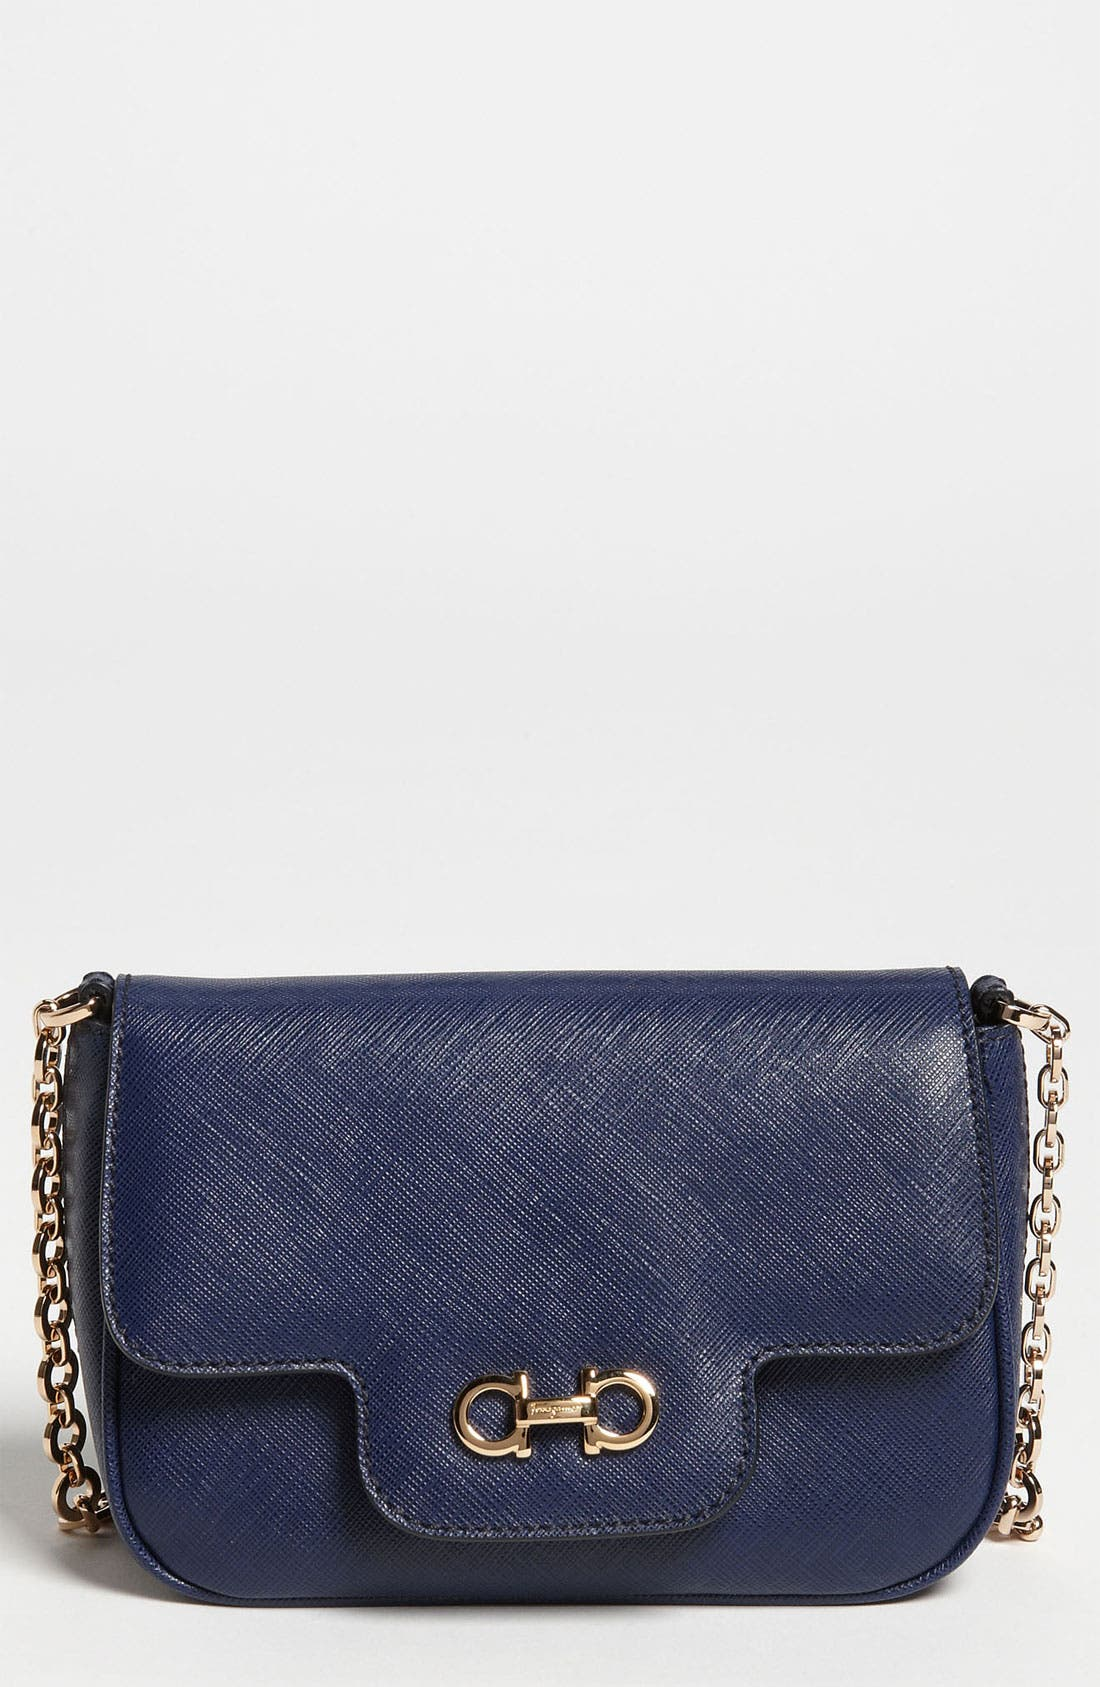 Main Image - Salvatore Ferragamo 'Fancy' Leather Shoulder Bag